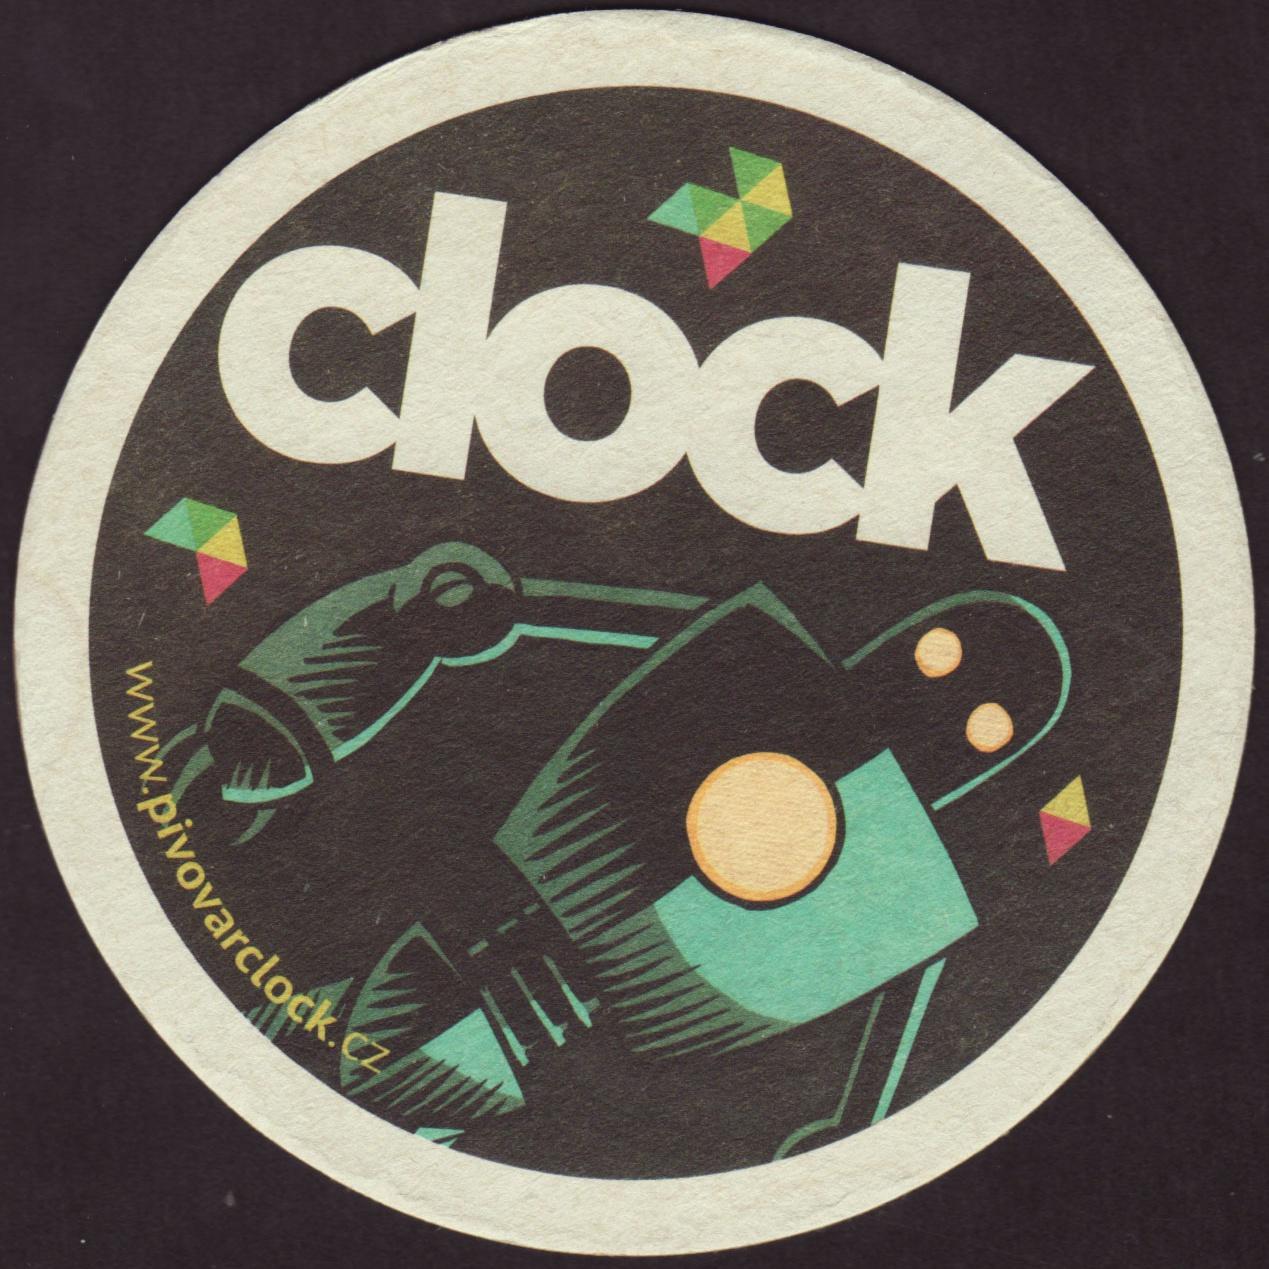 Black currant sour ale – Pivovar Clock Potštejn